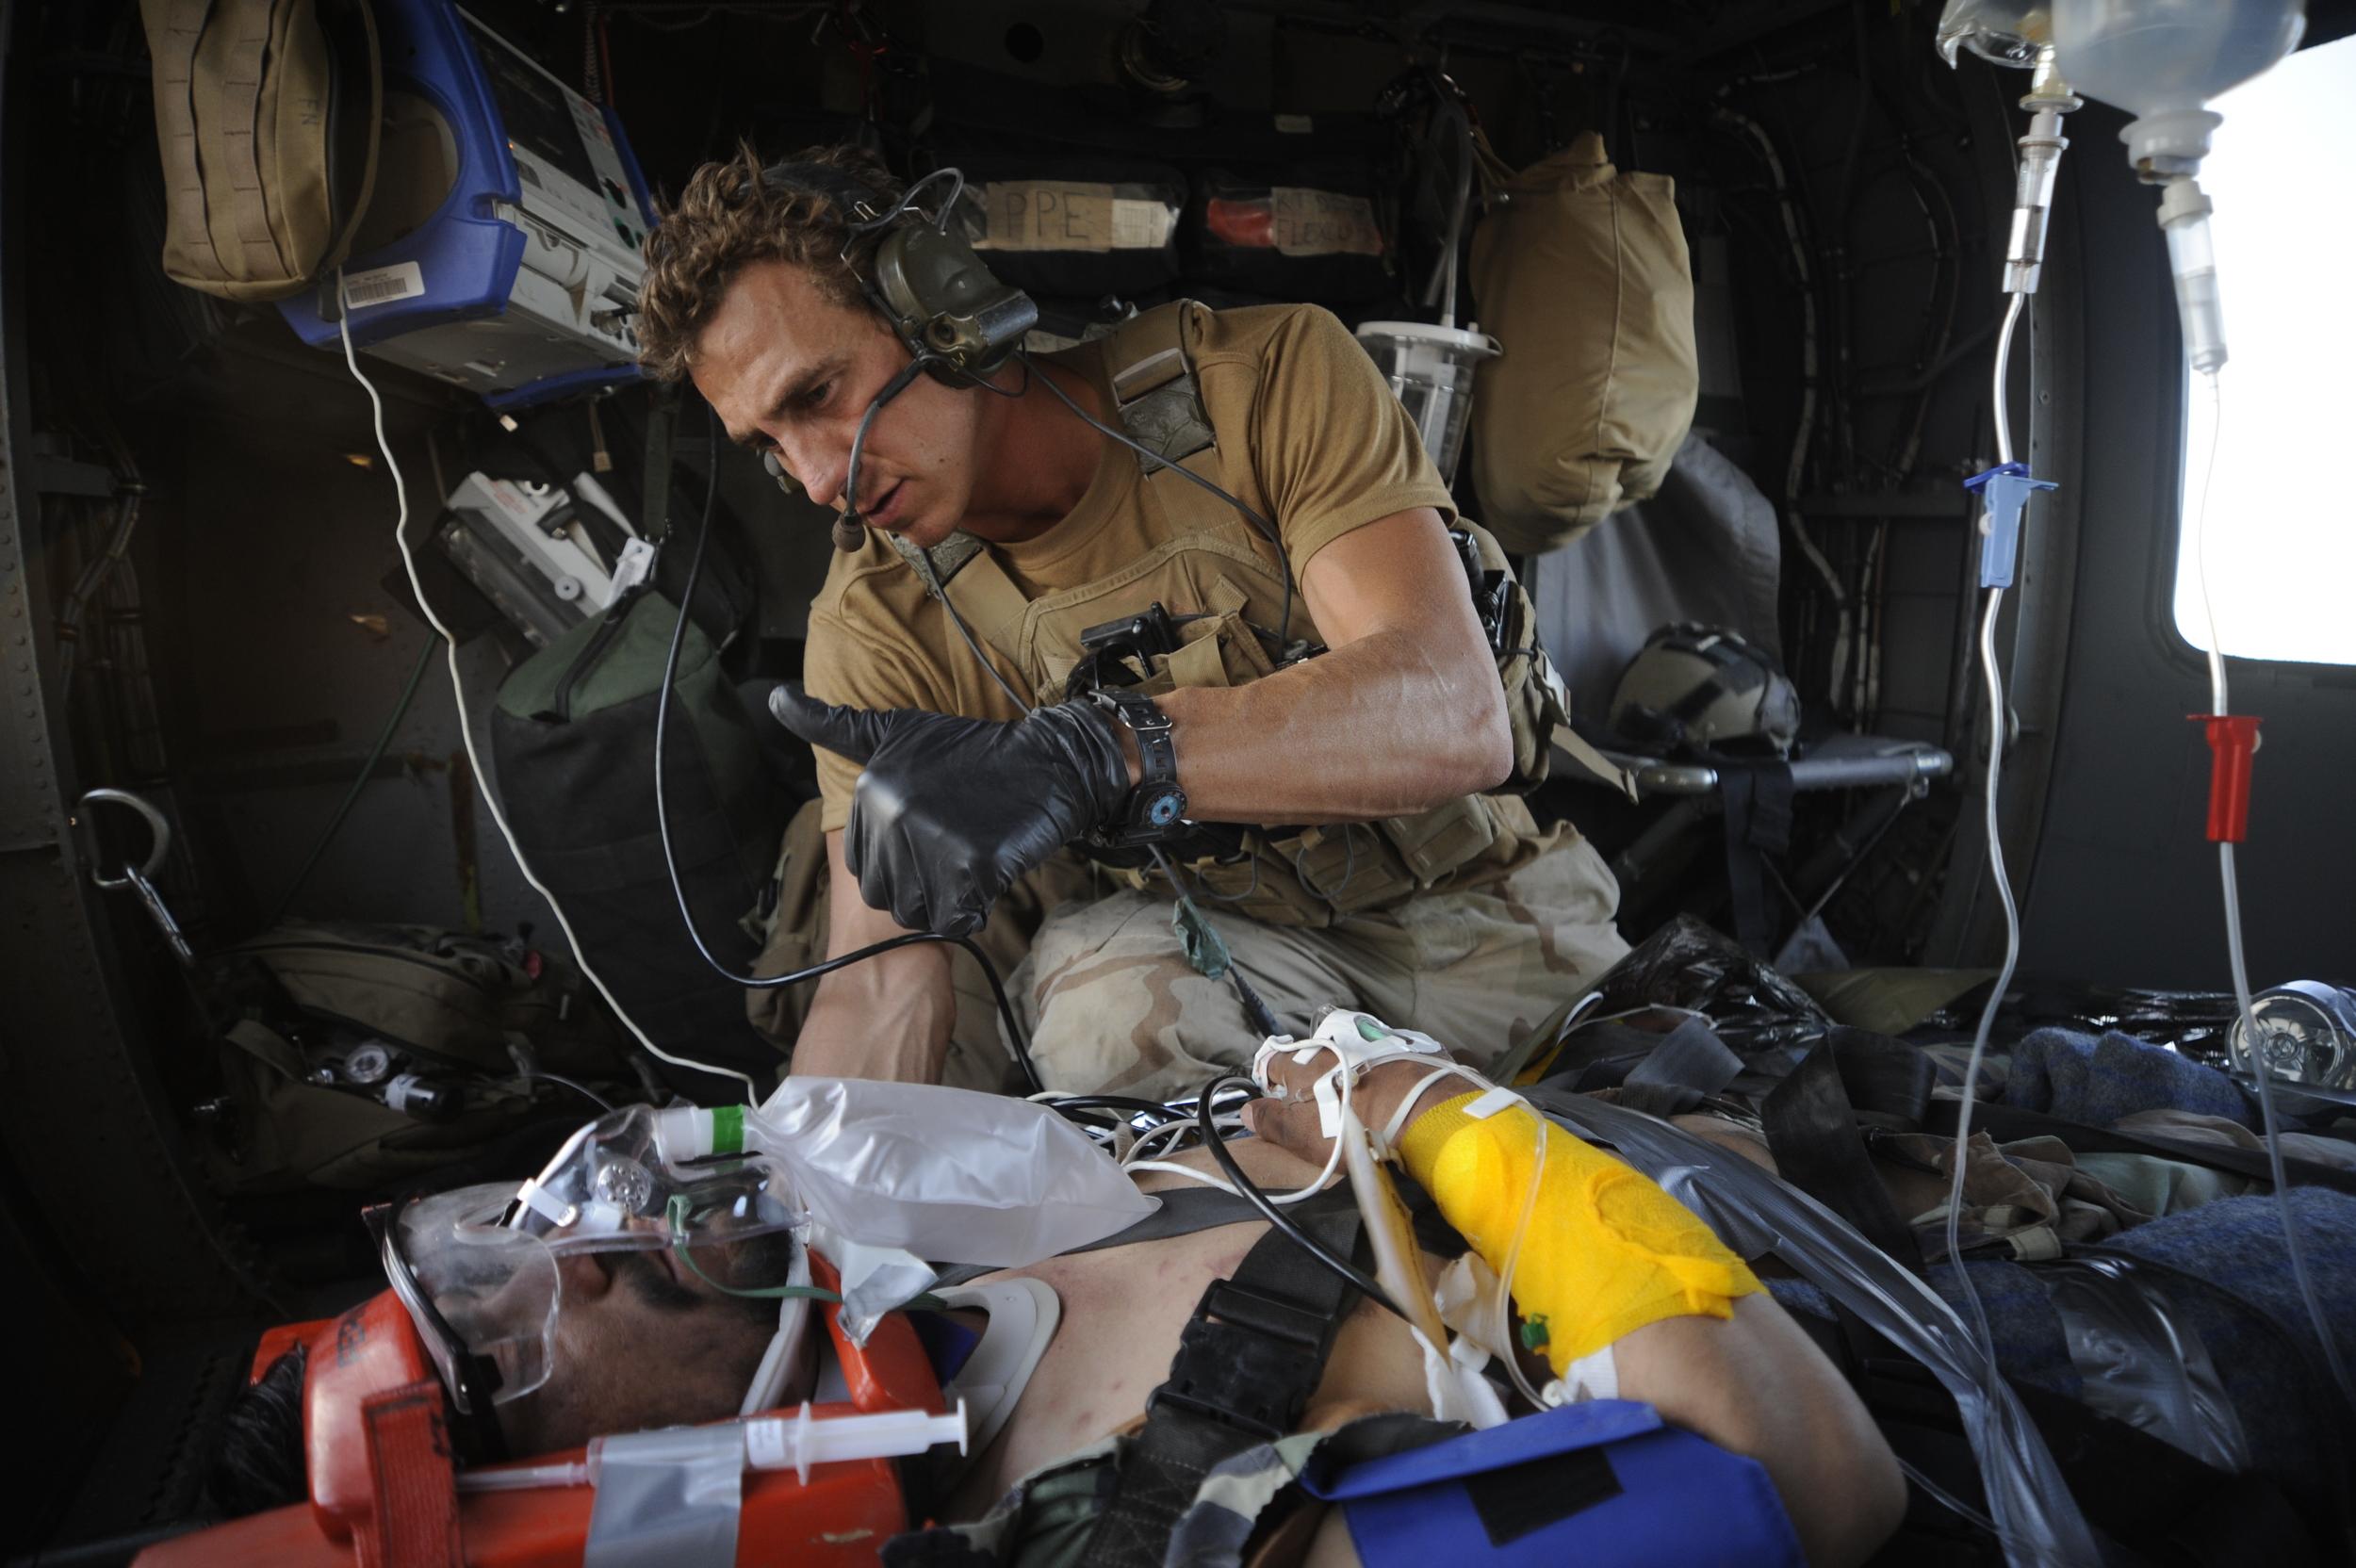 Nationally Registered Paramedics